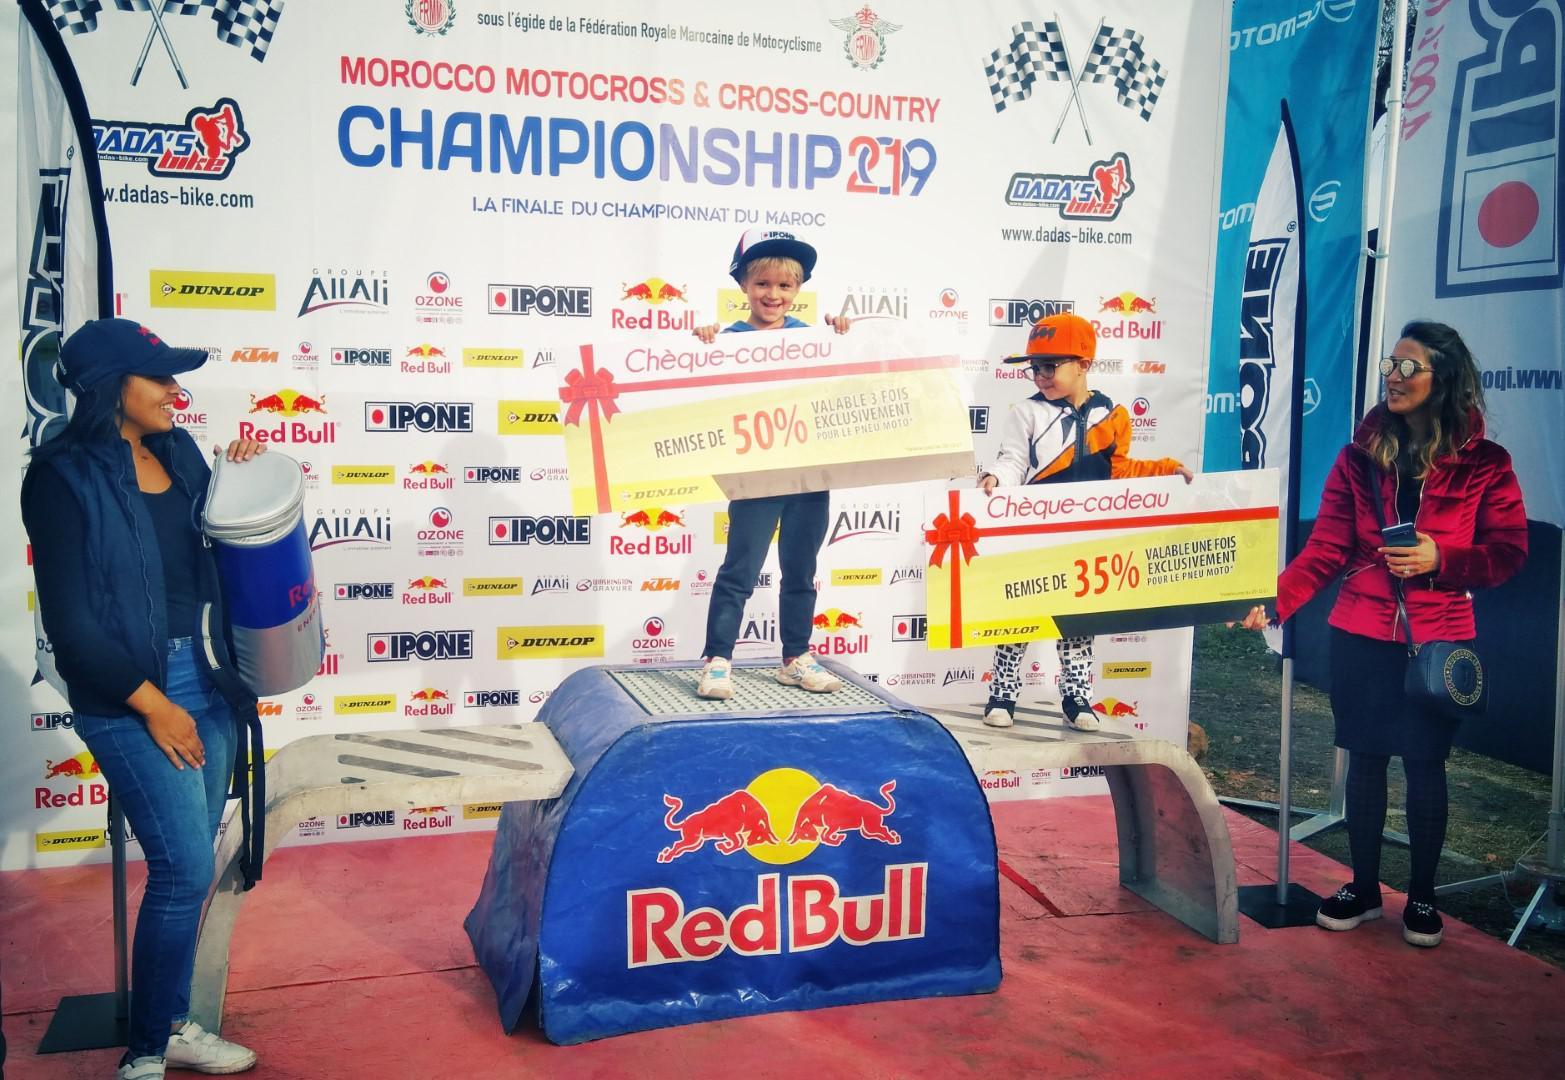 finale-du-championnat-du-maroc-de-motocross-et-cross-country-1164-7.jpg